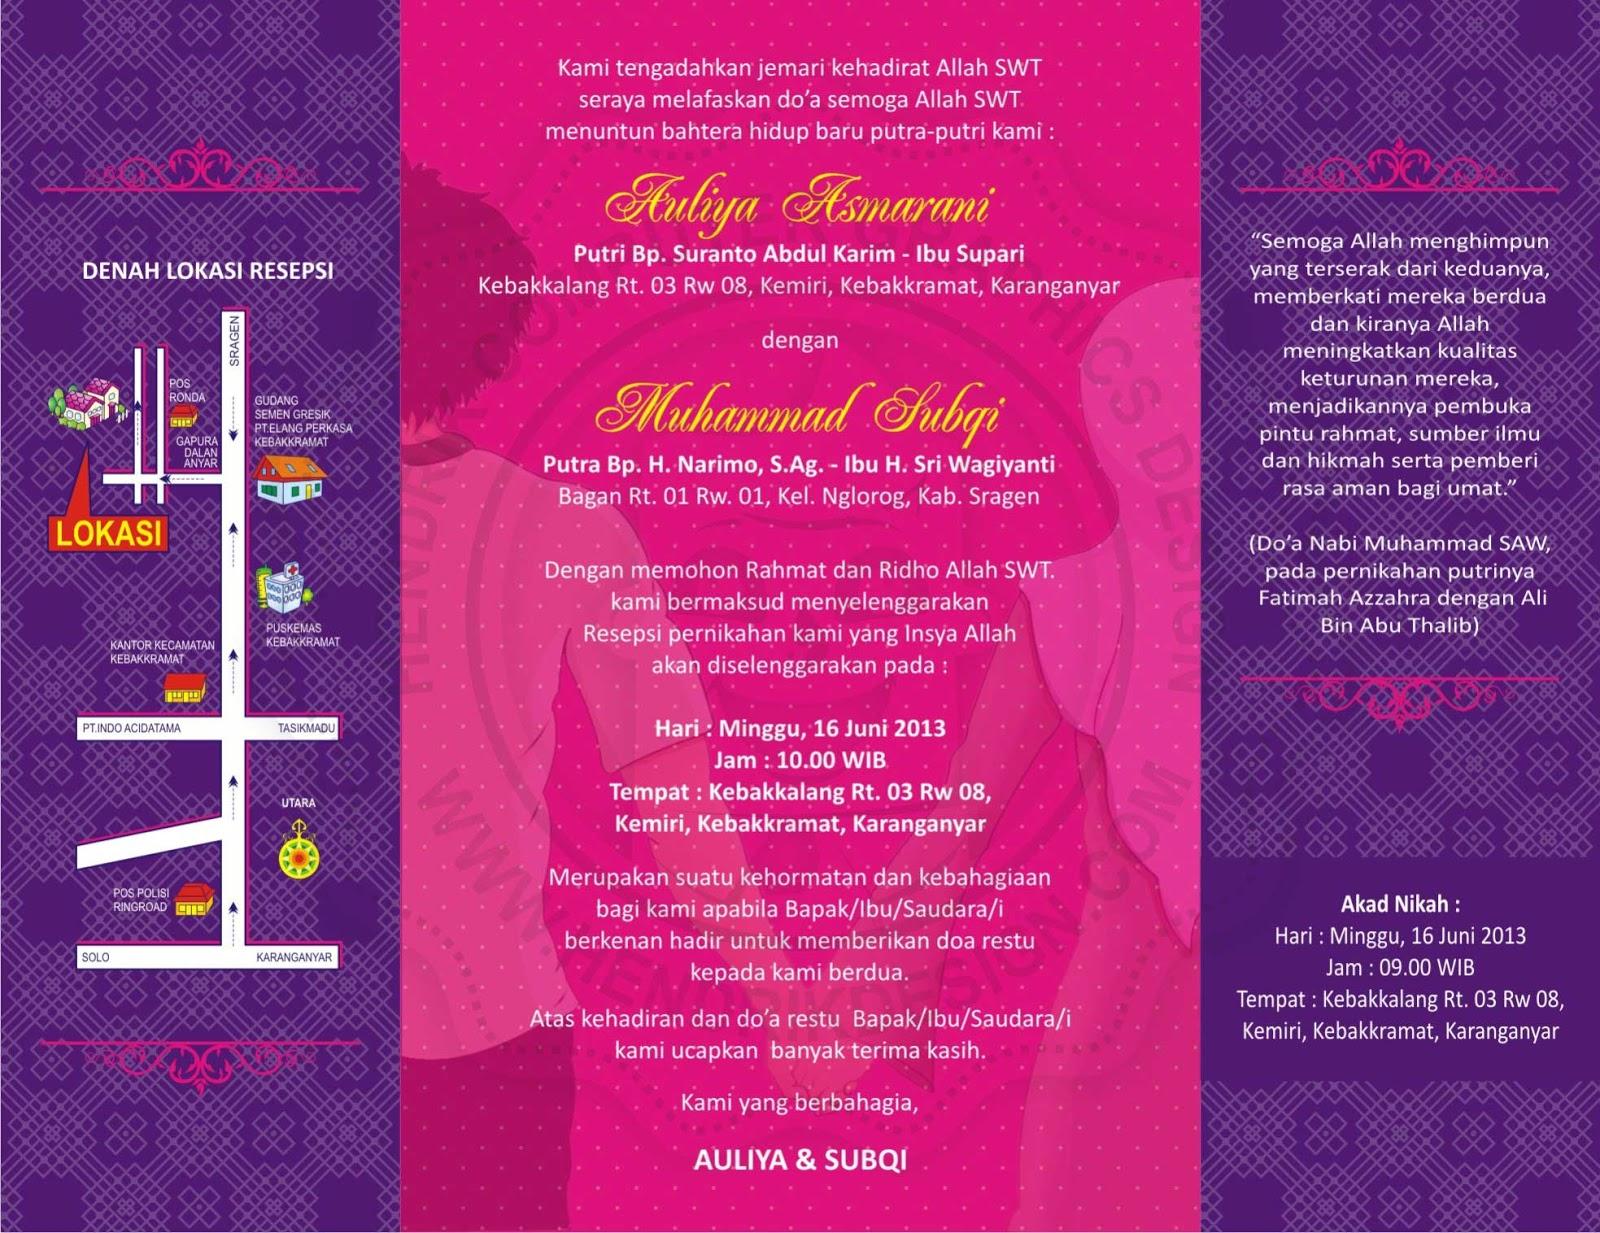 ... undangan pernikahan termurah di solo : Contoh Undangan Pernikahan Pink